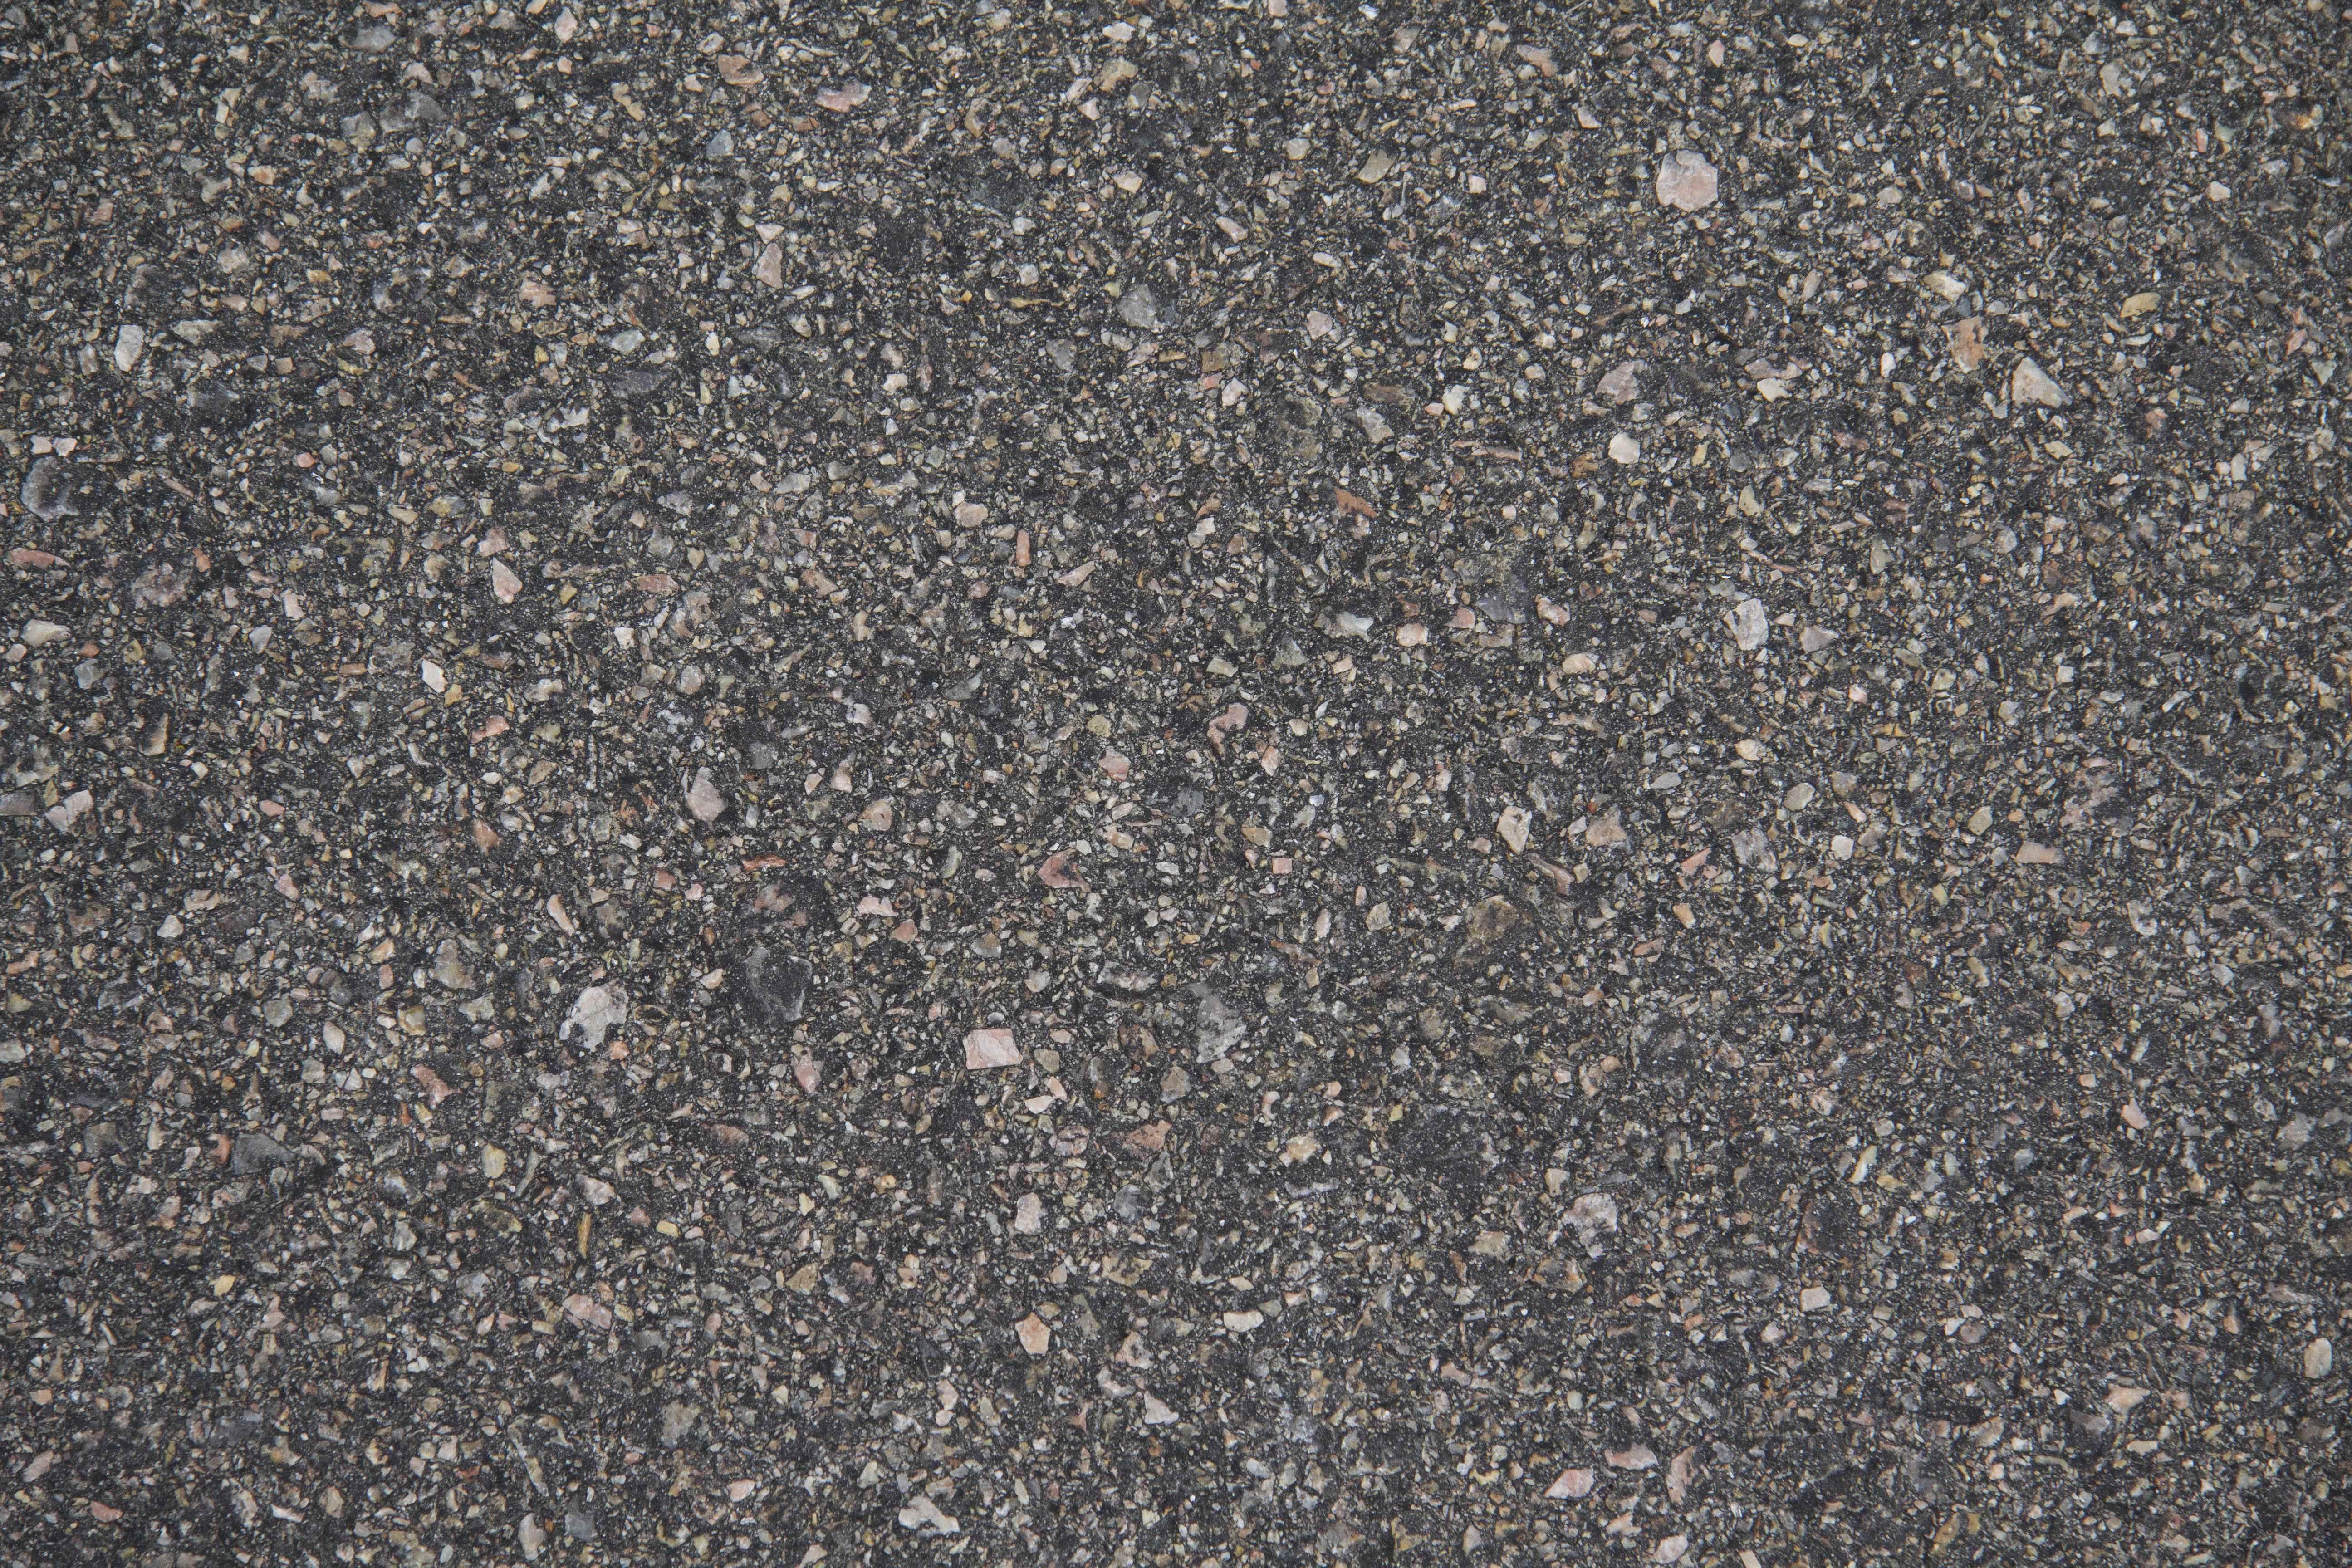 20 road textures asphalt textures freecreatives for High resolution textures